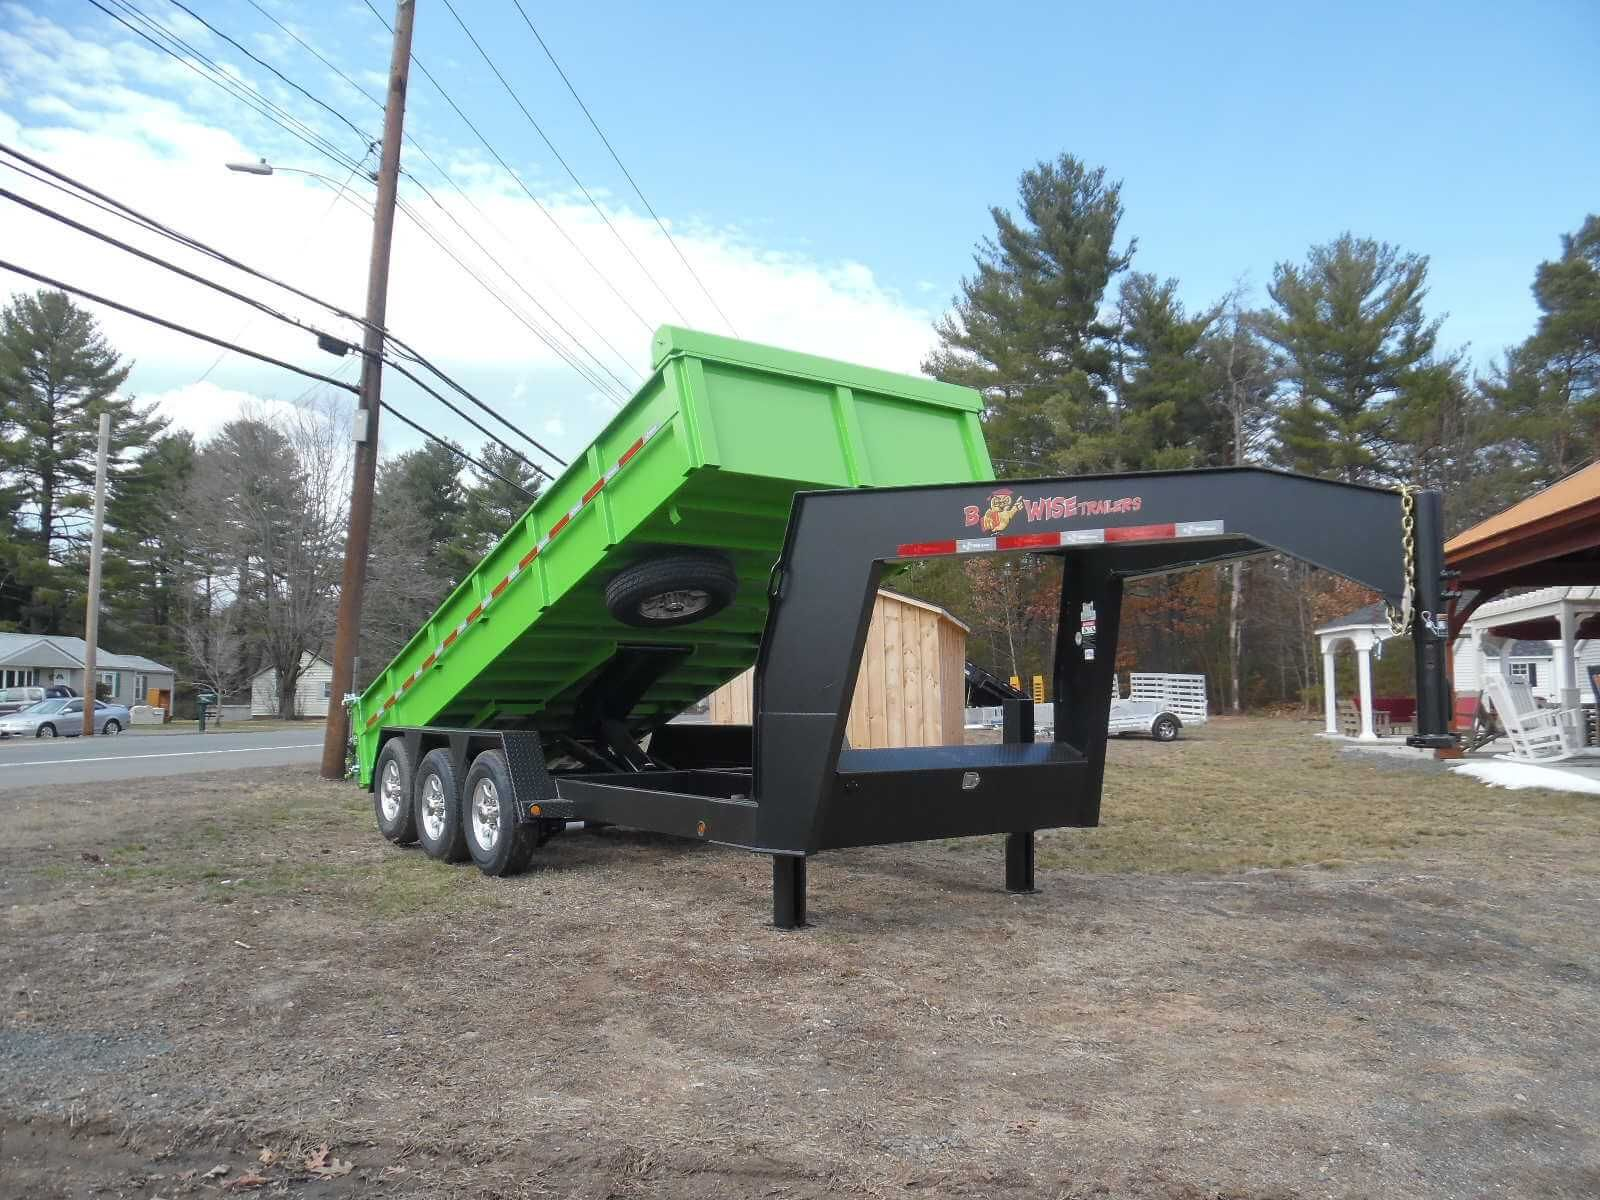 Bwise heavyduty triaxle dump trailer credit to hometown